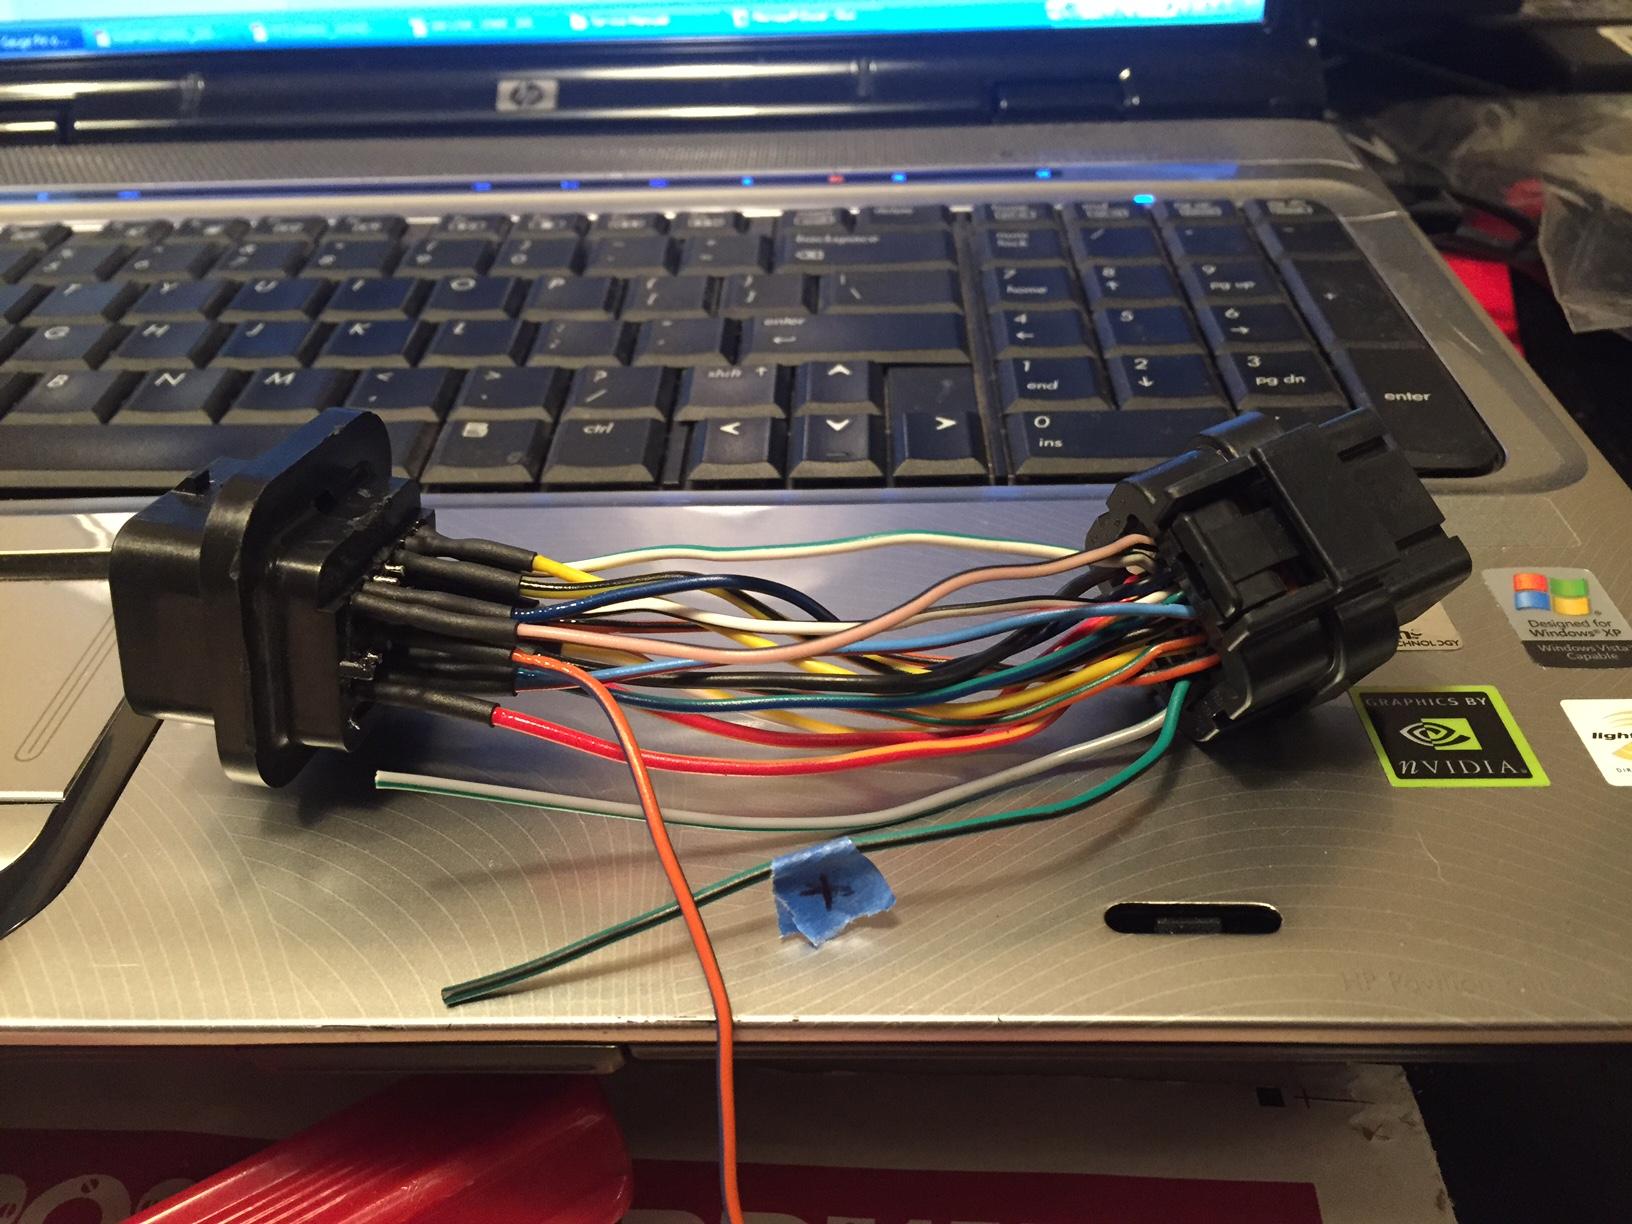 ducati hypermotard wiring diagram ducati wiring diagrams 494738d1421387056 ecu gauge pin out 3805 ducati hypermotard wiring diagram